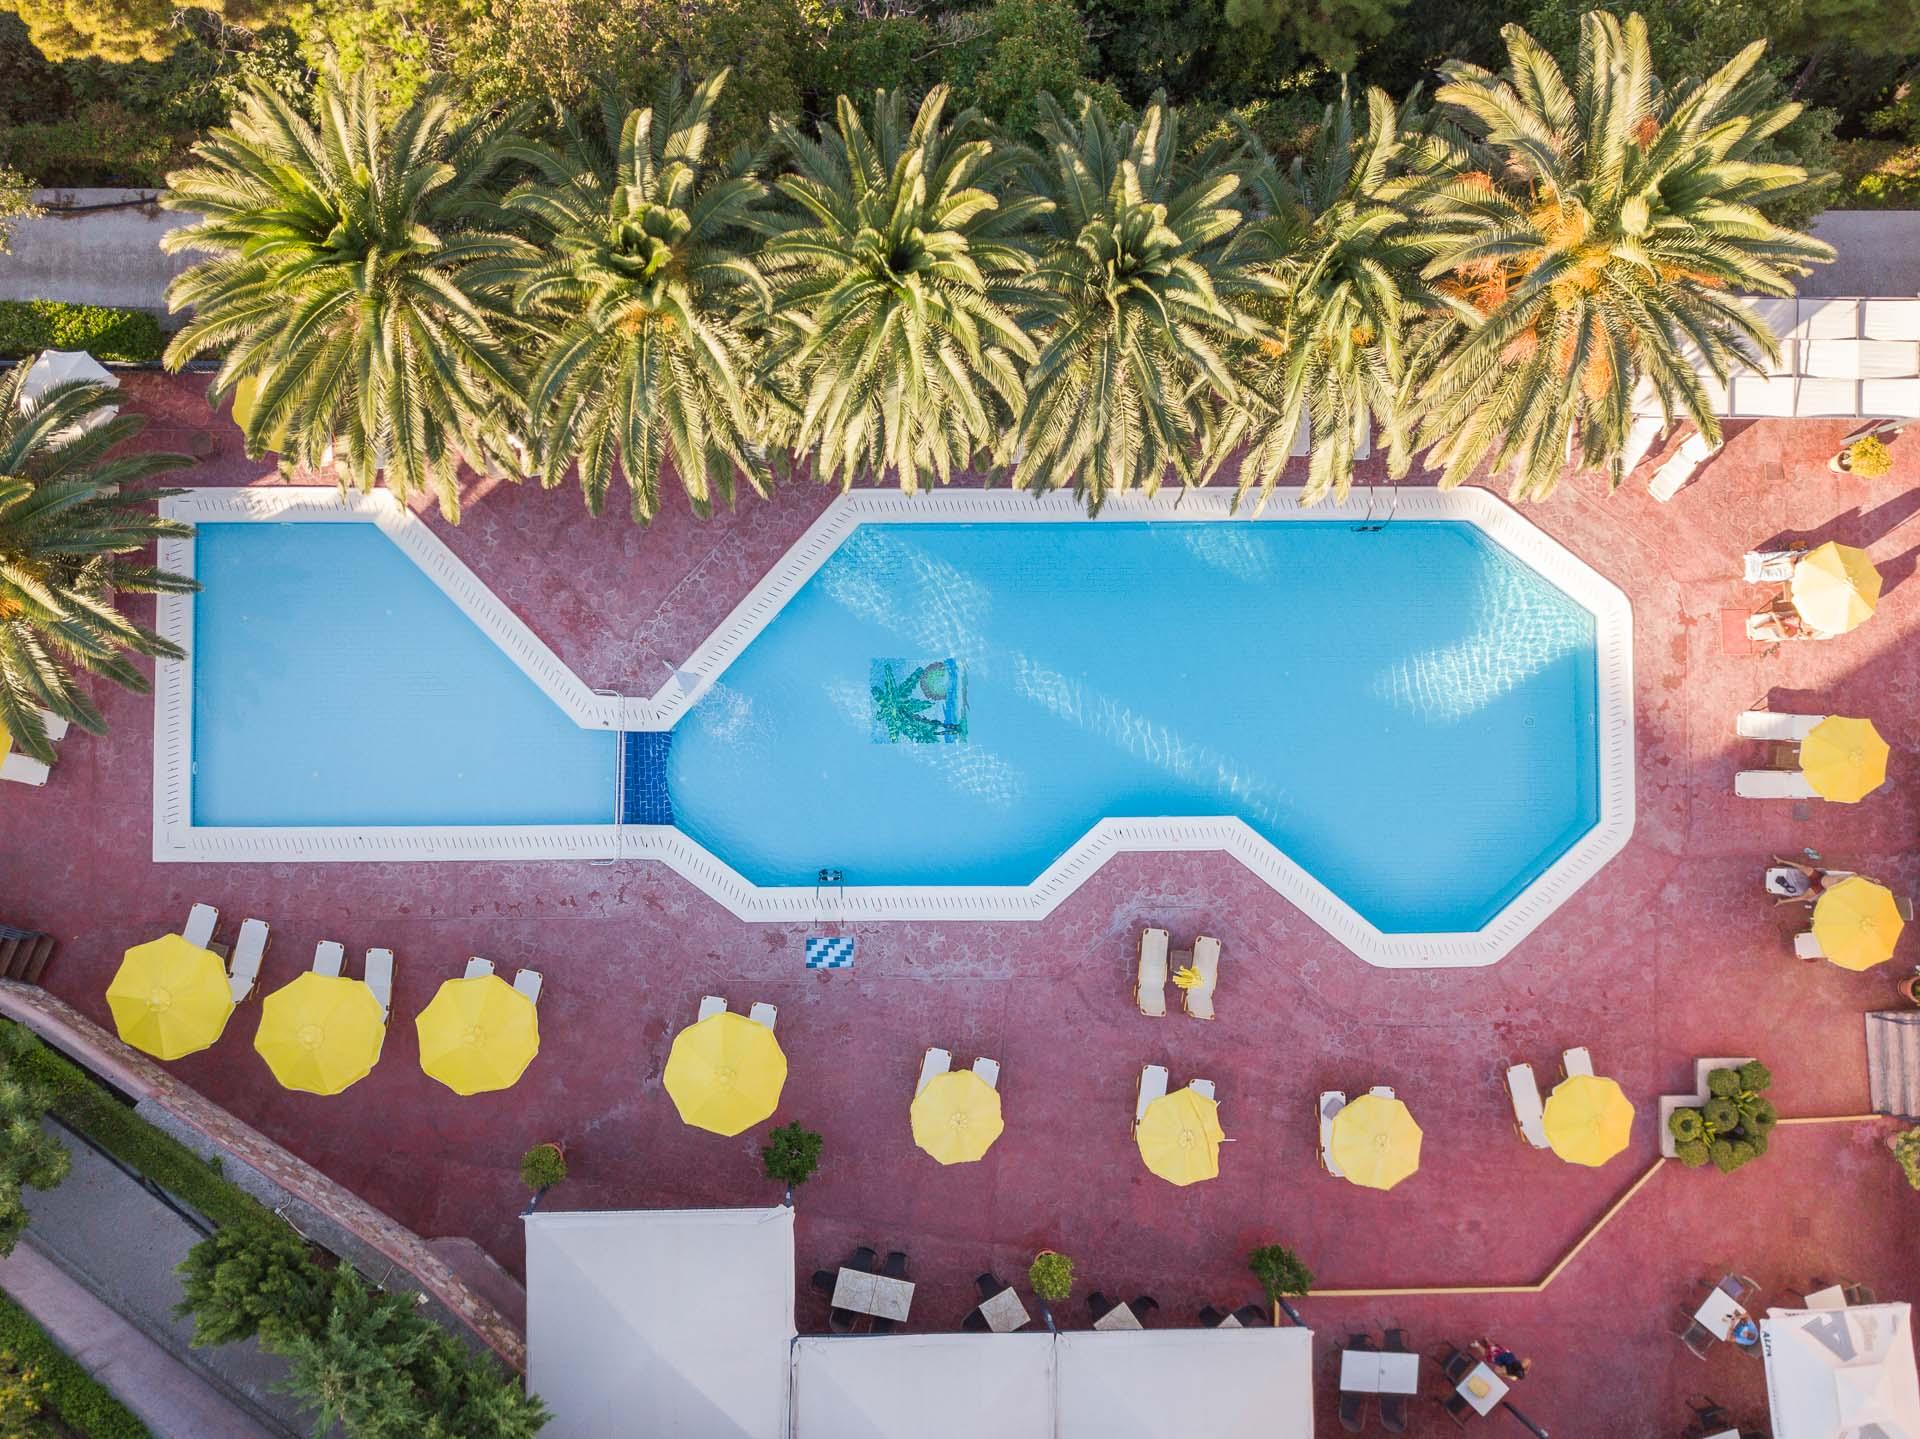 Sunrise Resort aerial shot